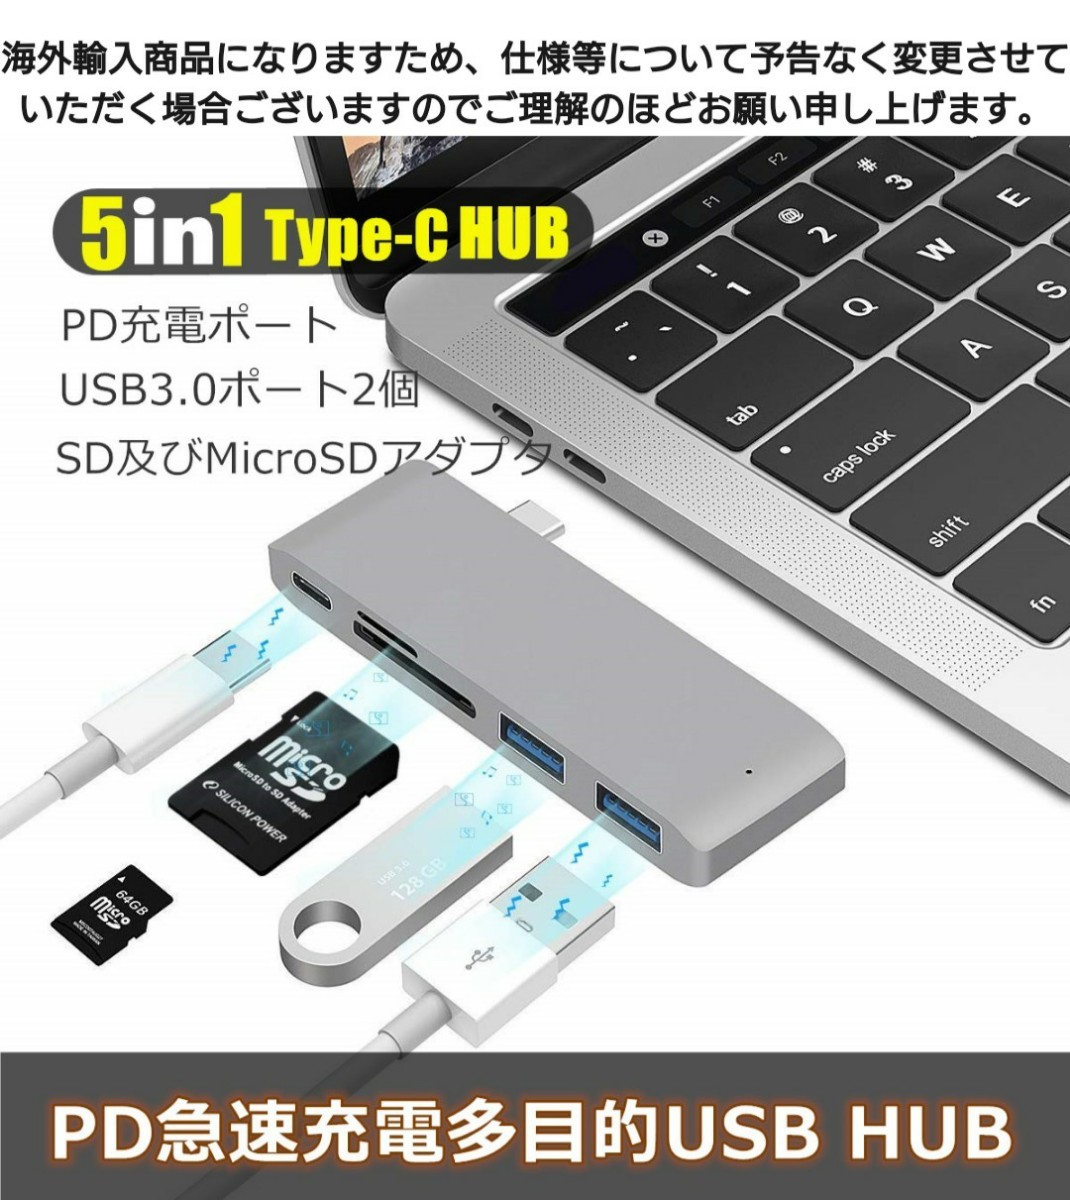 USB Type C ハブ 5 in 1 PD充電 USB 3.0ポート